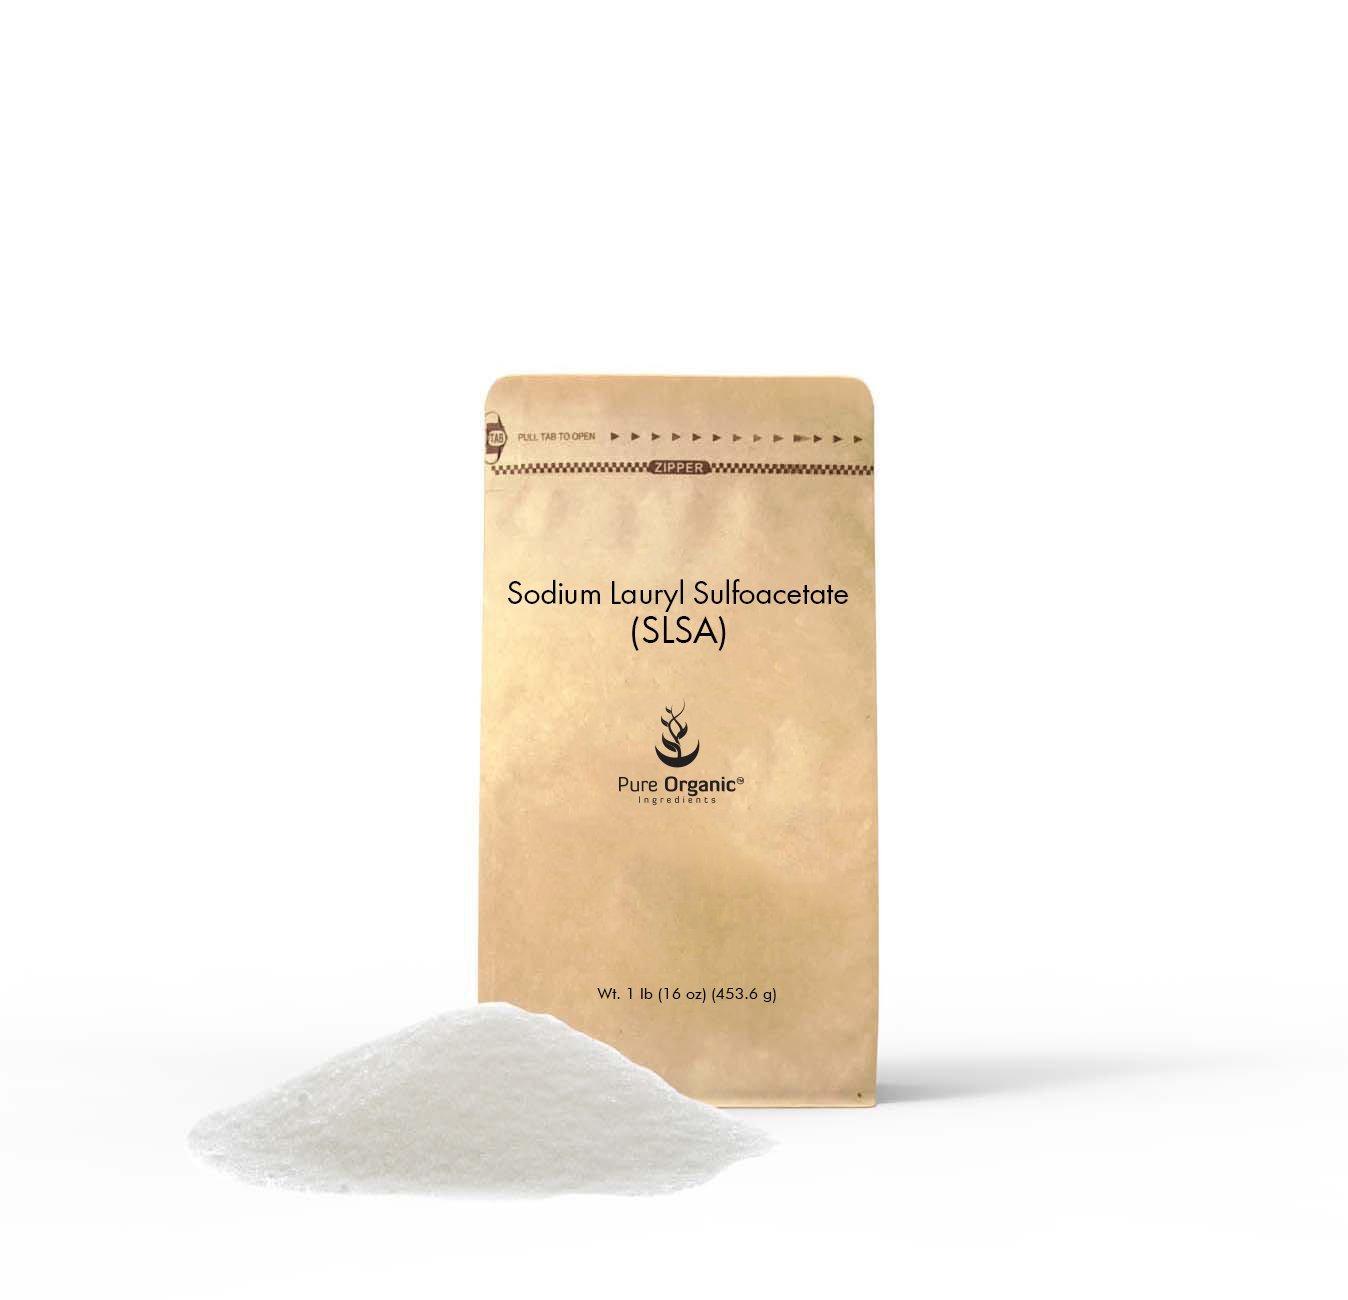 Sodium Lauryl Sulfoacetate (SLSA) Bath Bomb bubbles, Gentle on Skin 1 lb (16 oz), Eco-Friendly Packaging (Also Available in 4 oz, 11 oz, 1 lb, 2 lb, 3 lb)